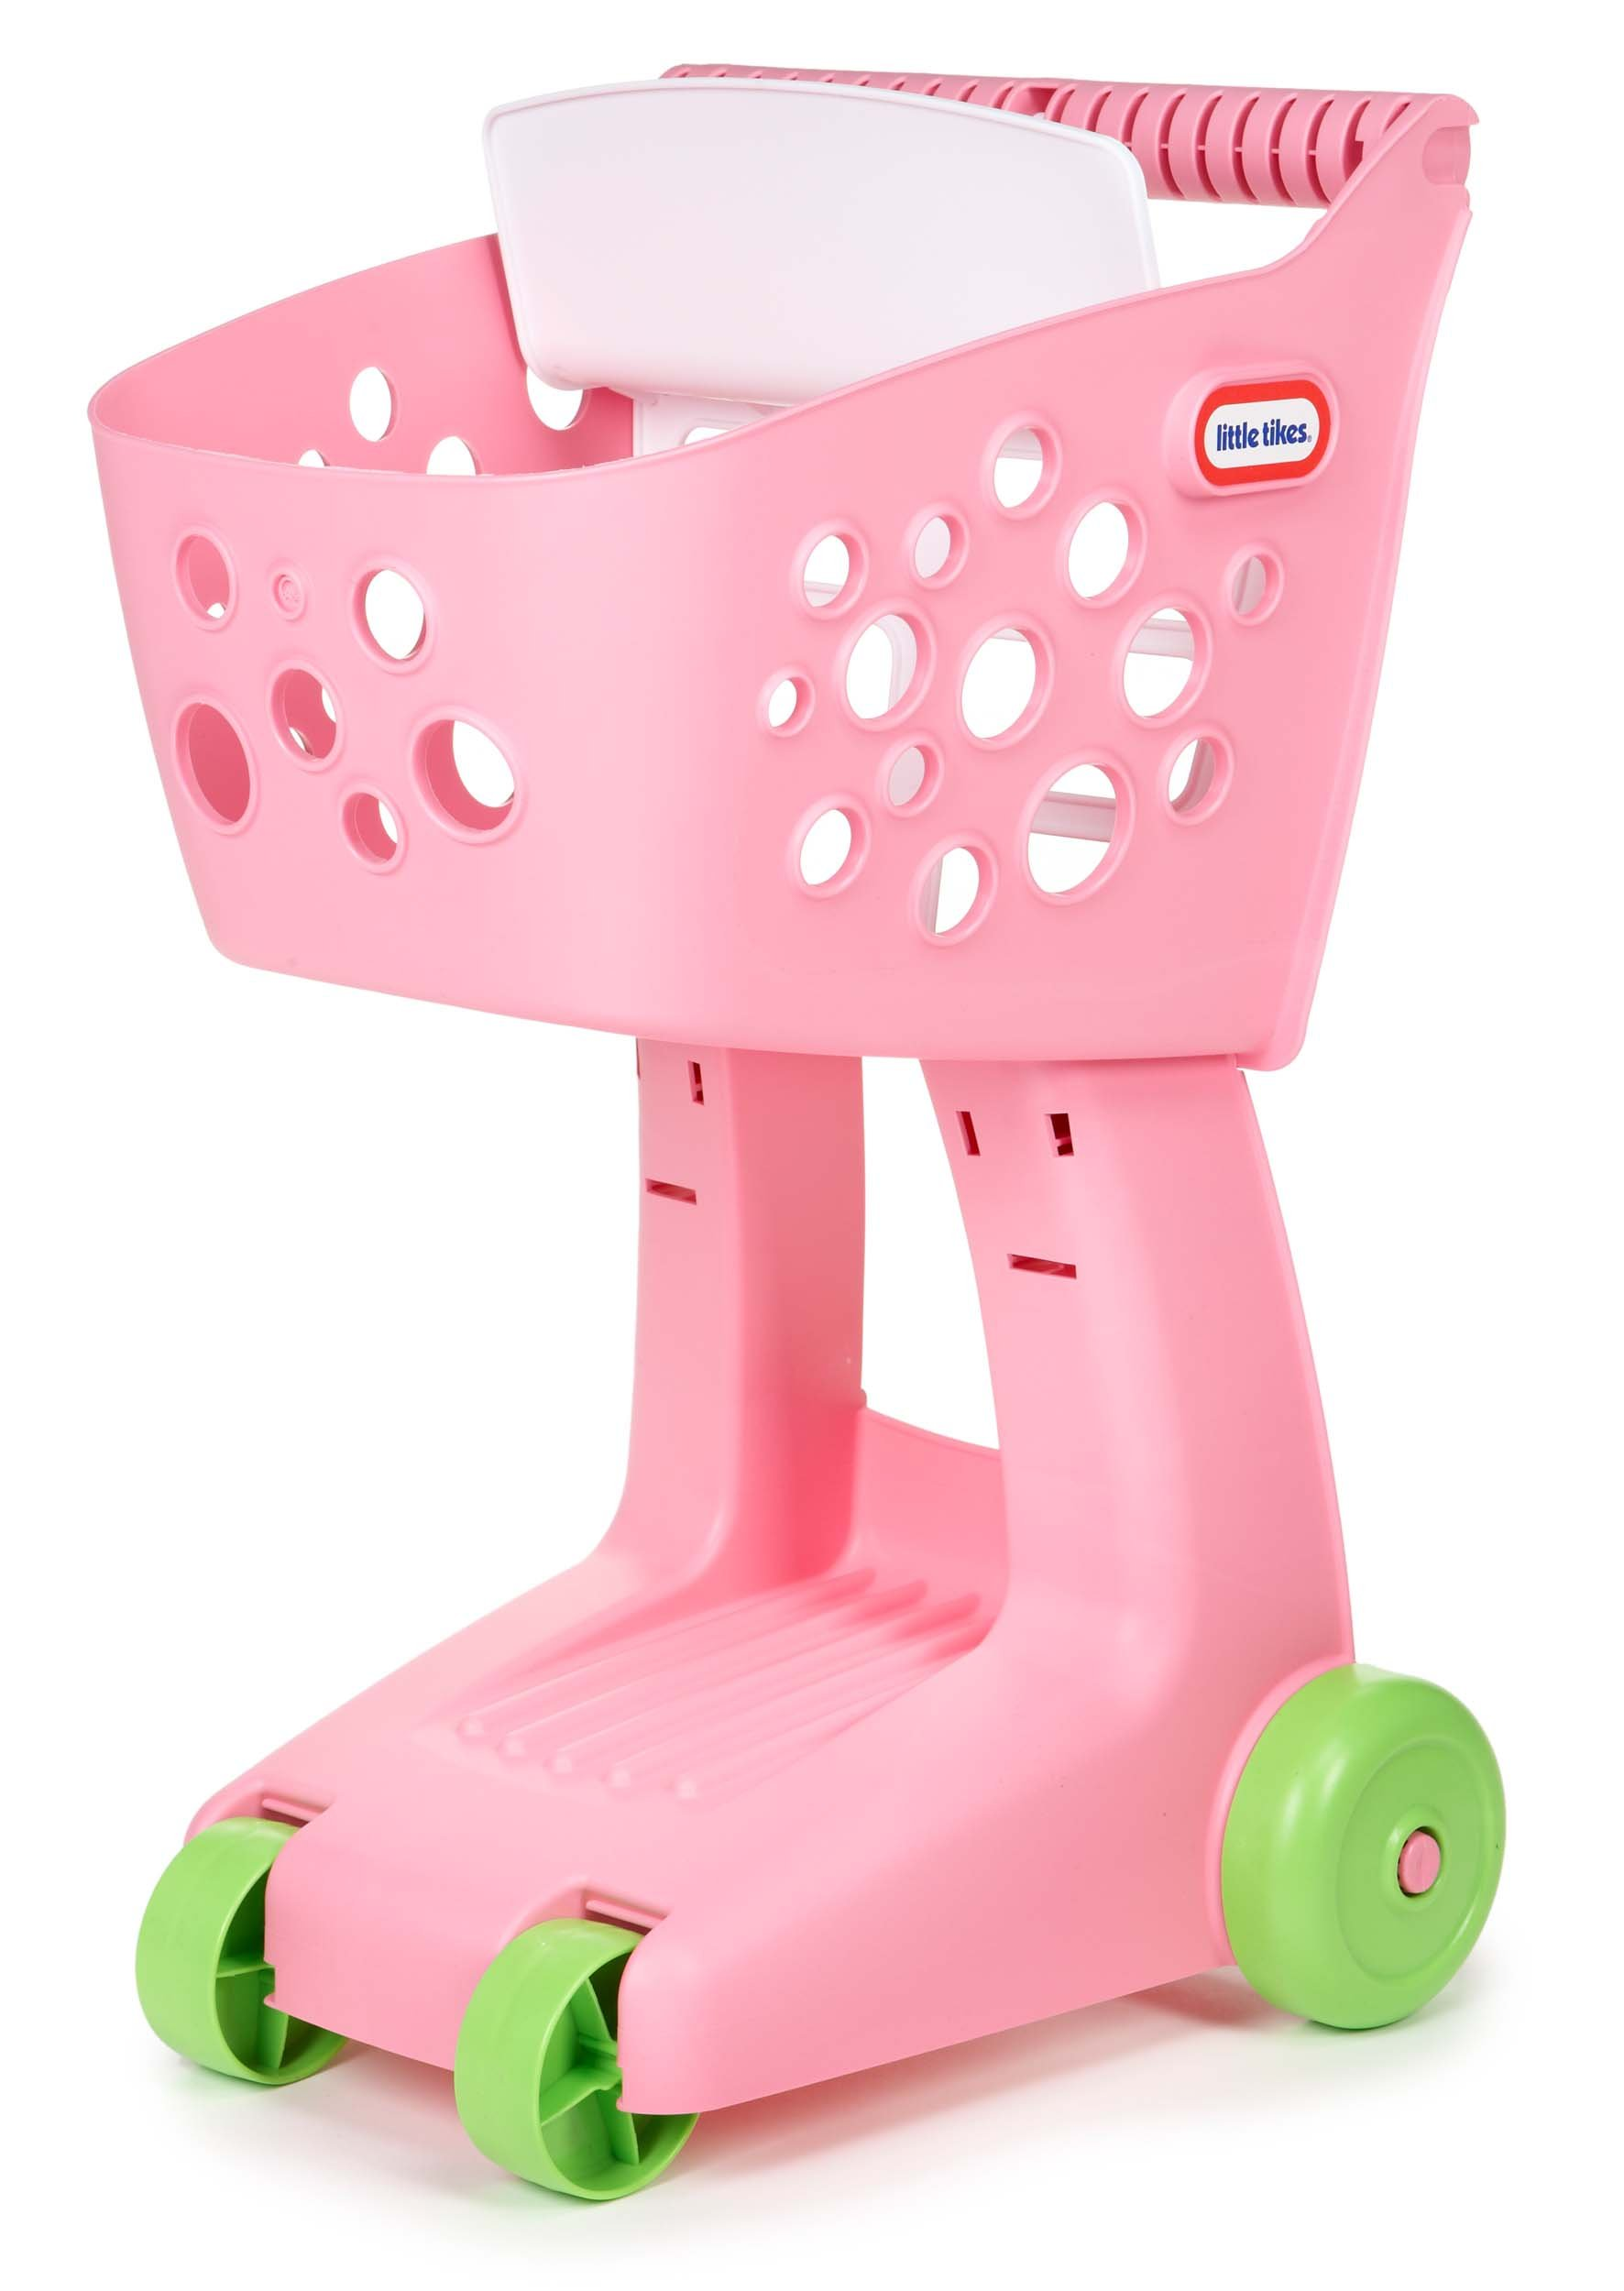 Little Tikes Lil' Shopper - Pink by Little Tikes